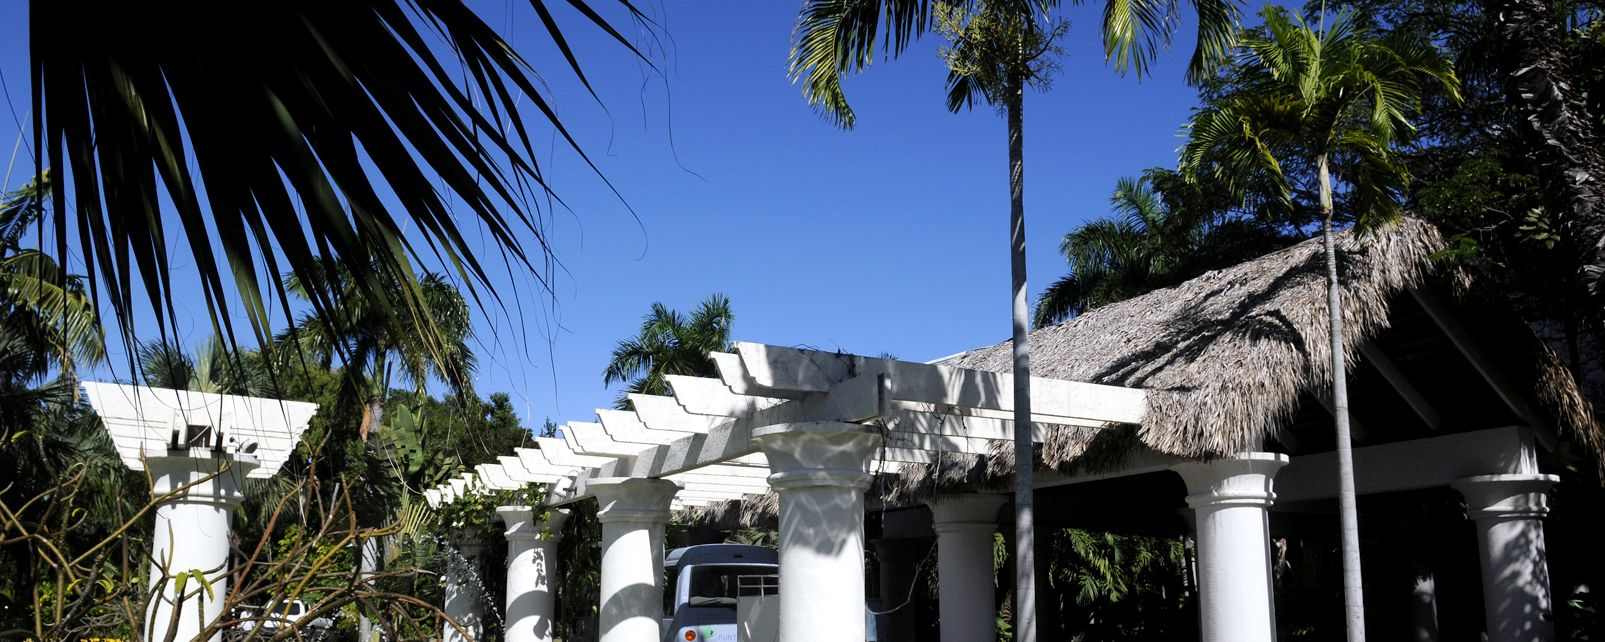 Hotel Punta Cana Hotel